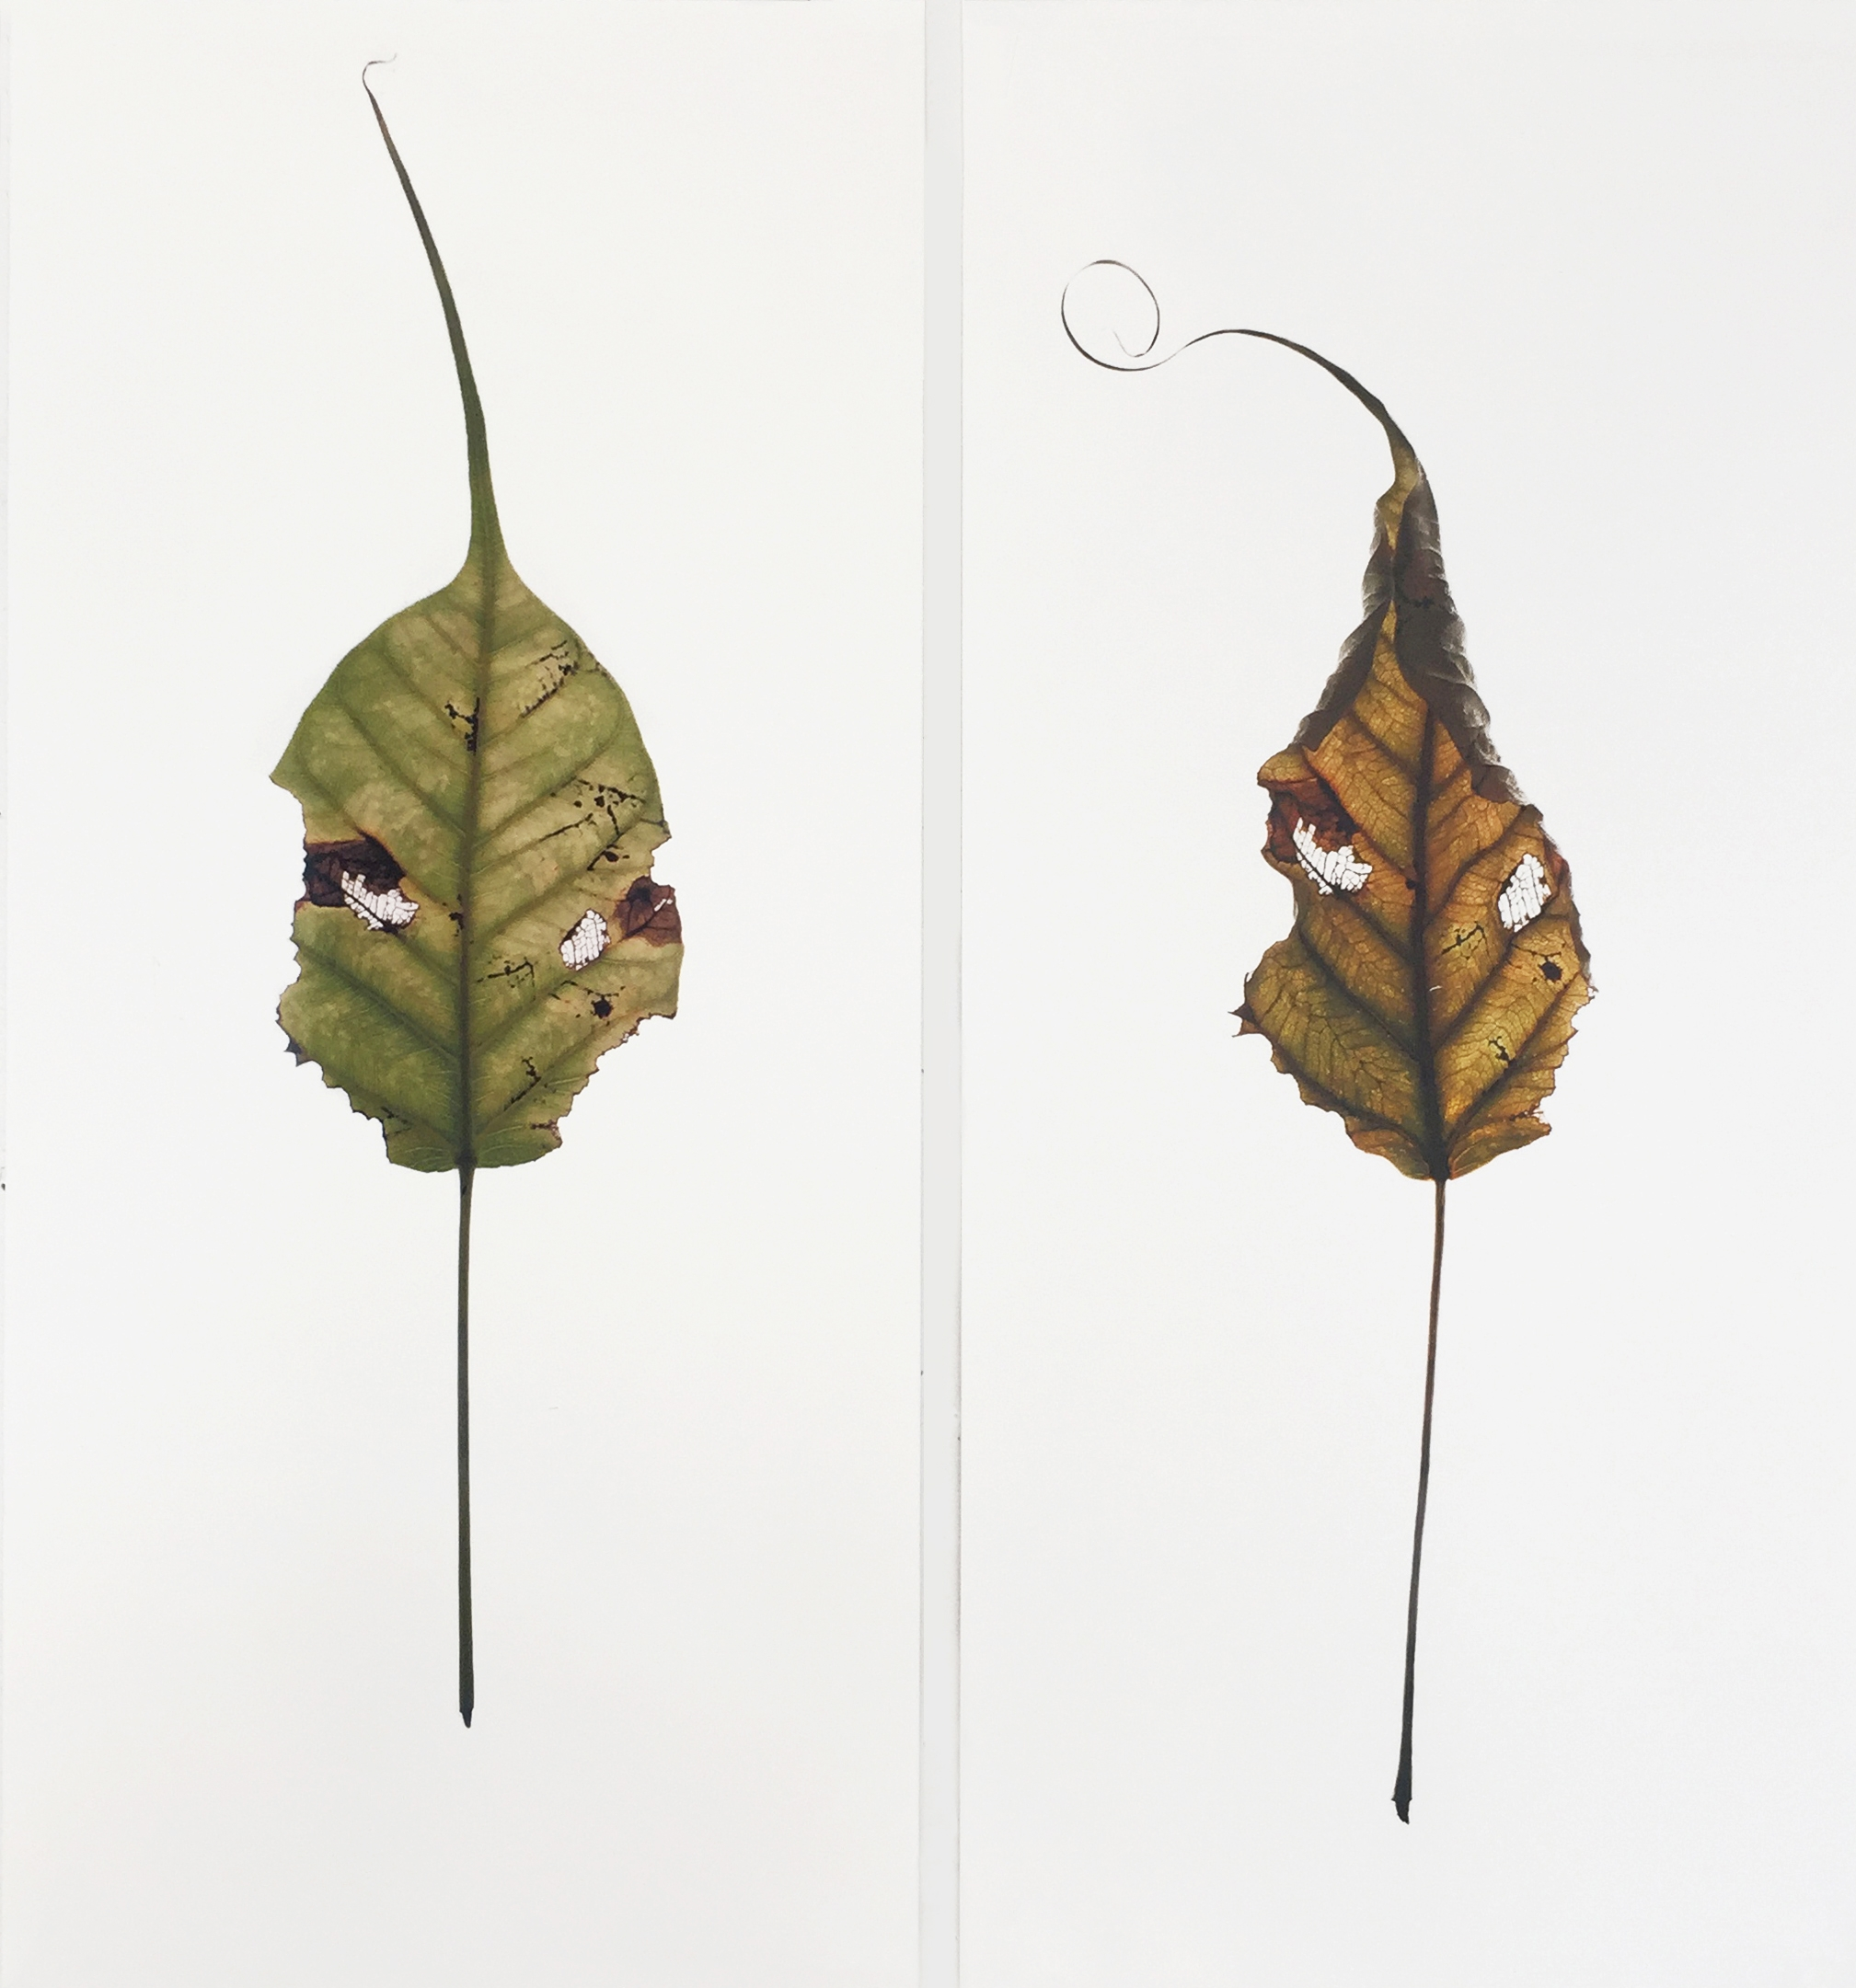 Bayan Leaves (detail), 2015, Digital print on prepared paper, 11 x 7.75 inches each